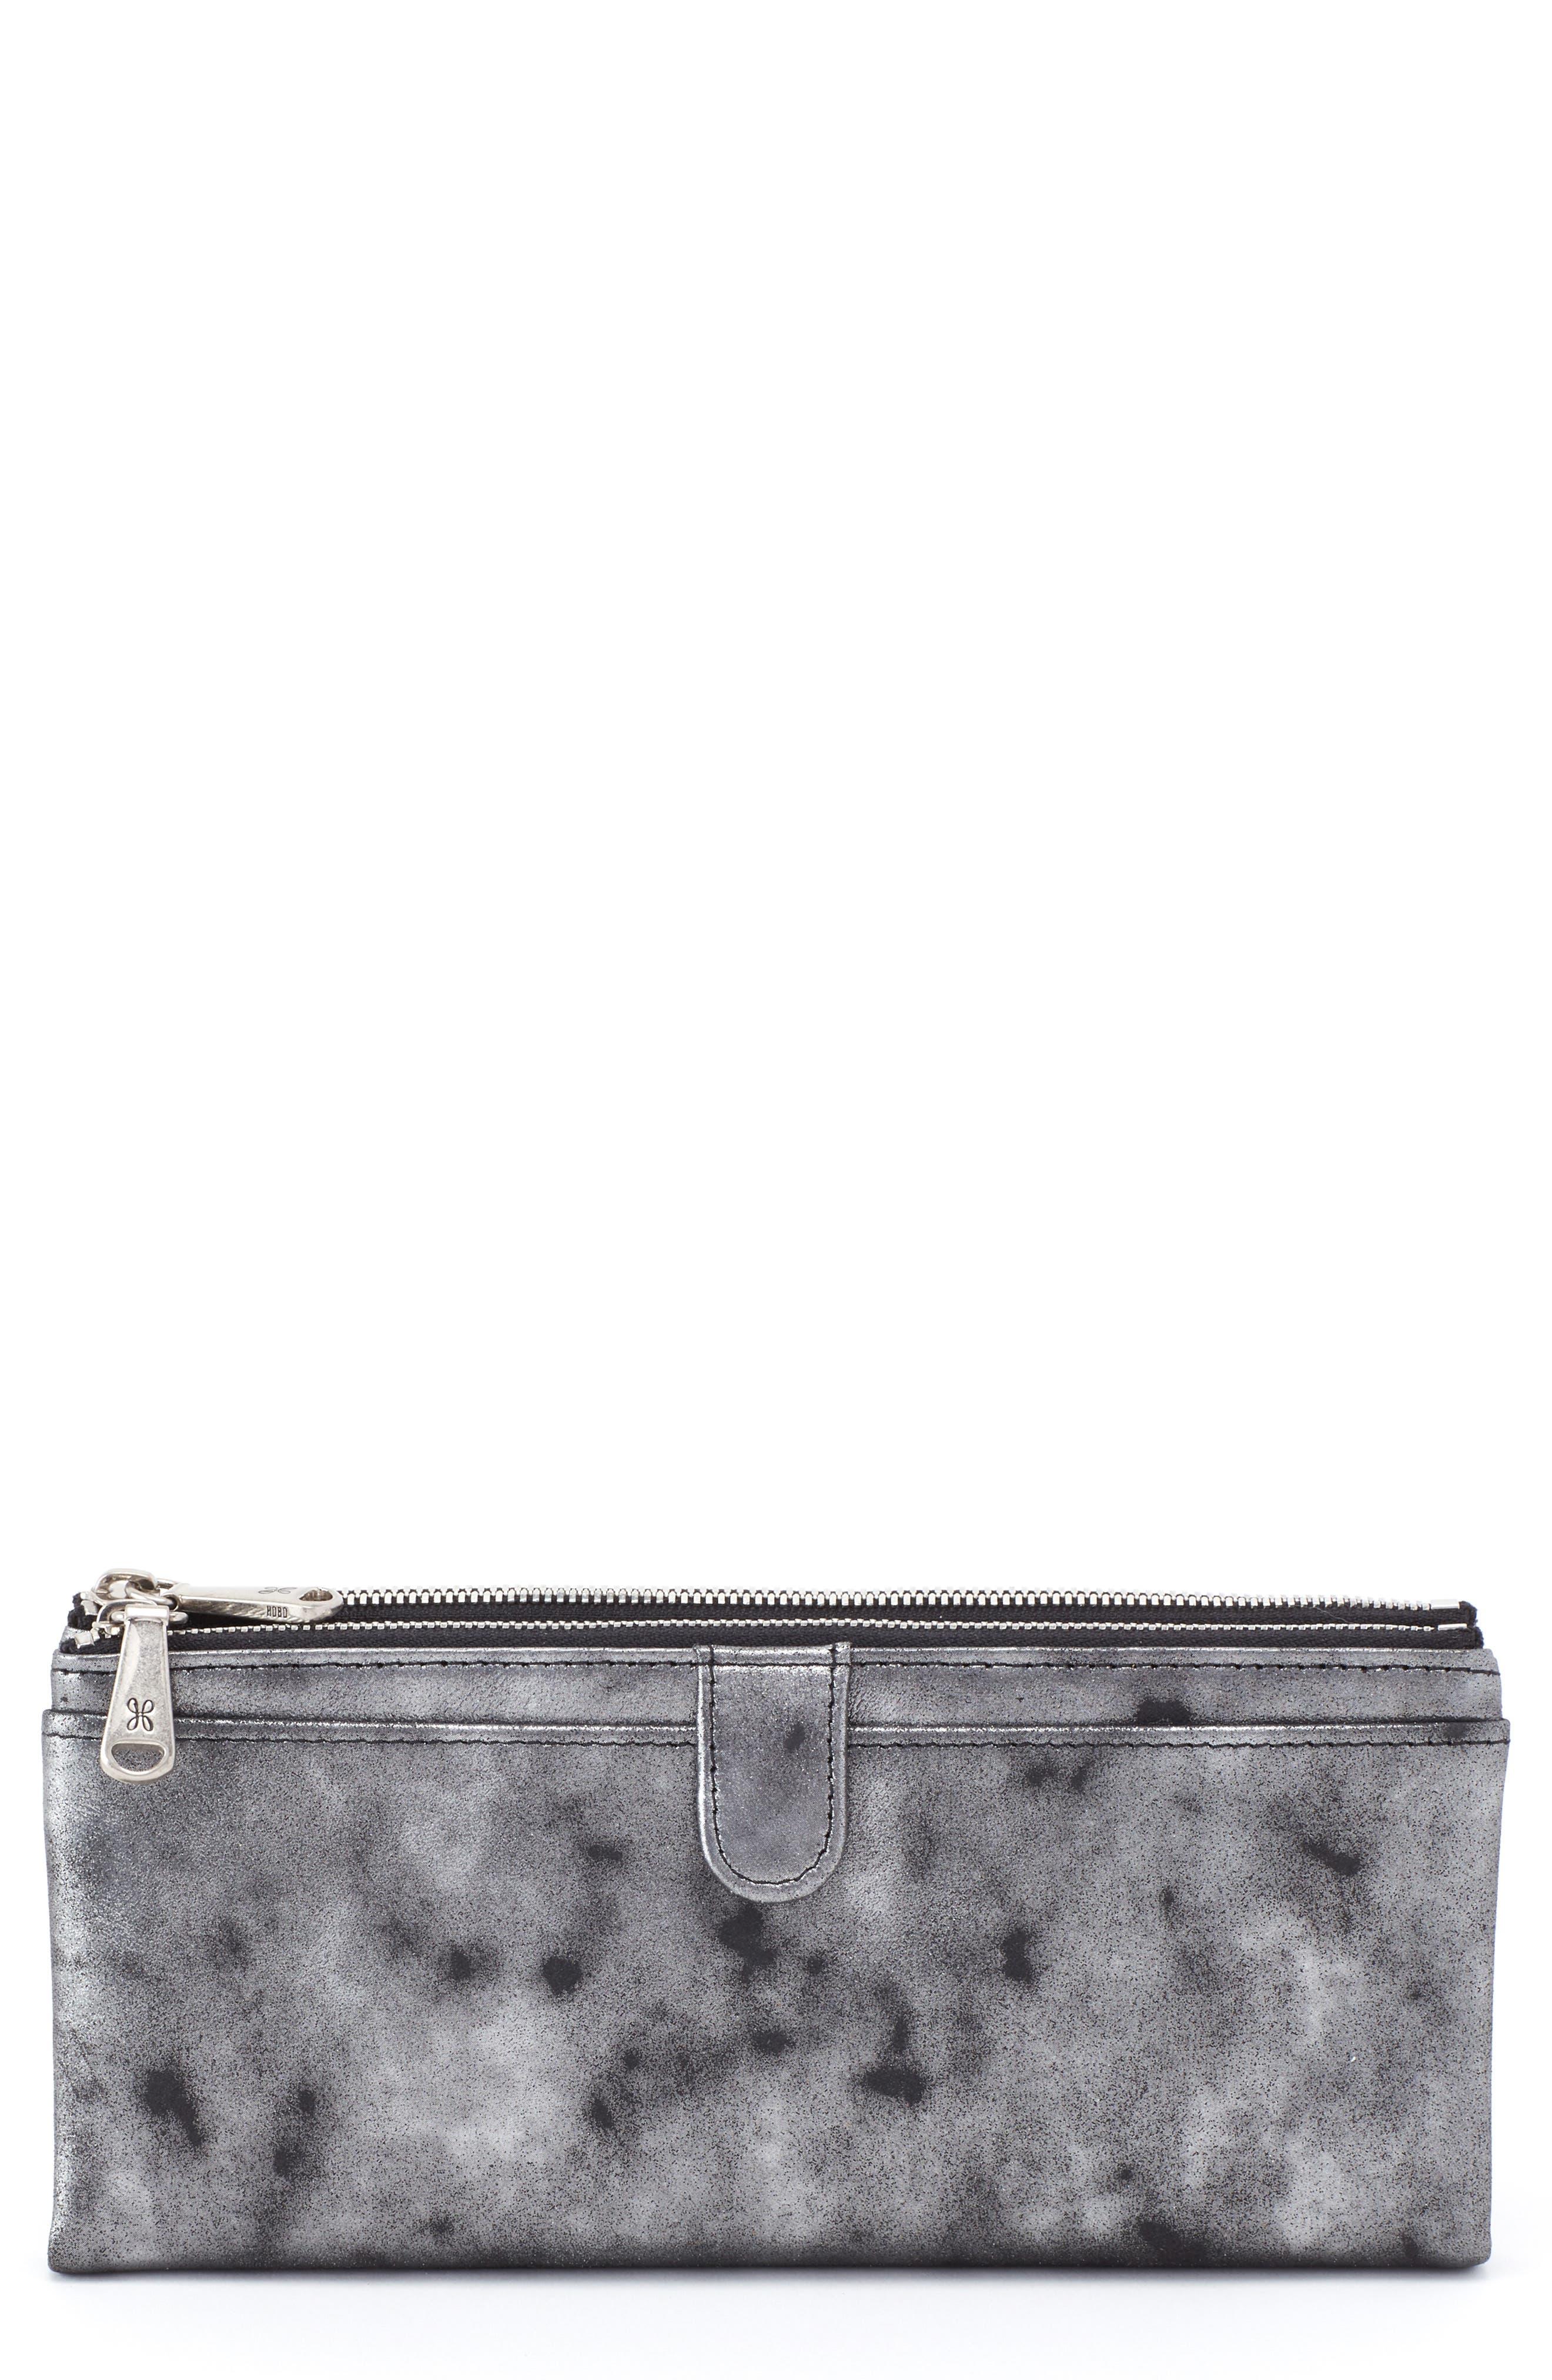 Taylor Glazed Wallet,                         Main,                         color, 021